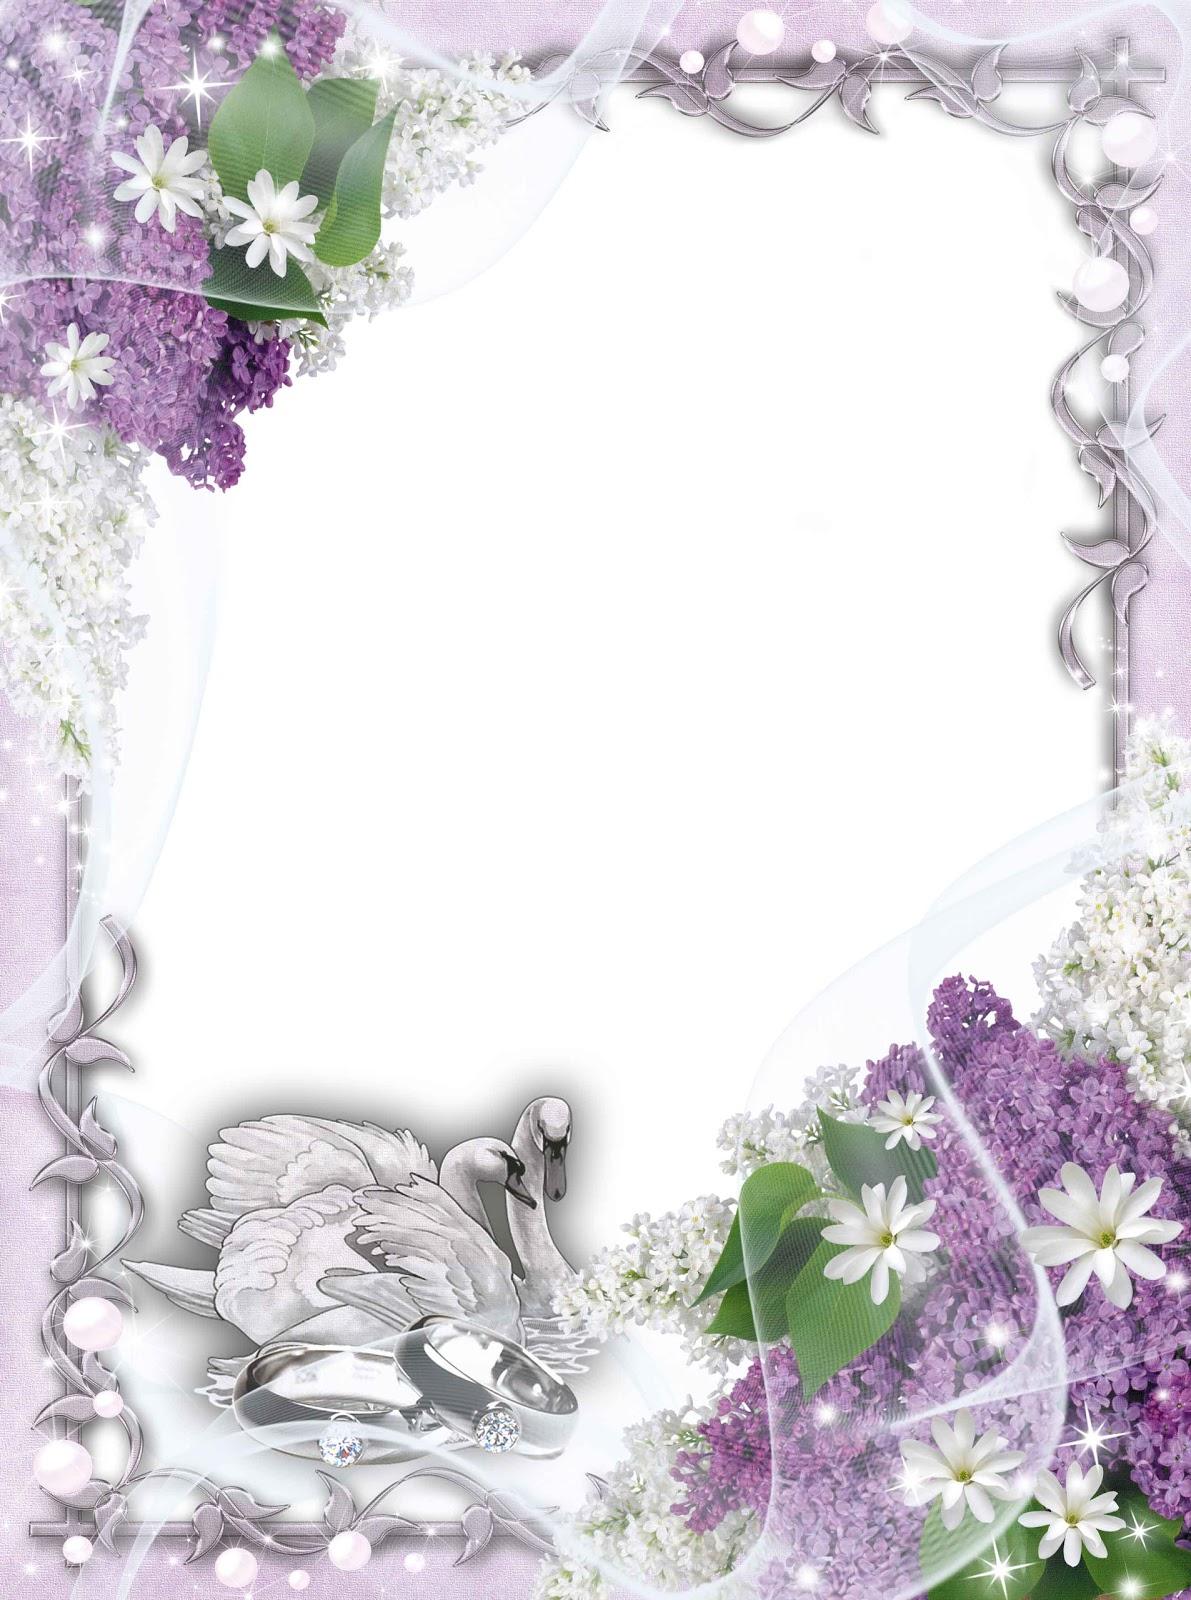 Download Png Wedding Frame Images Free #35178.